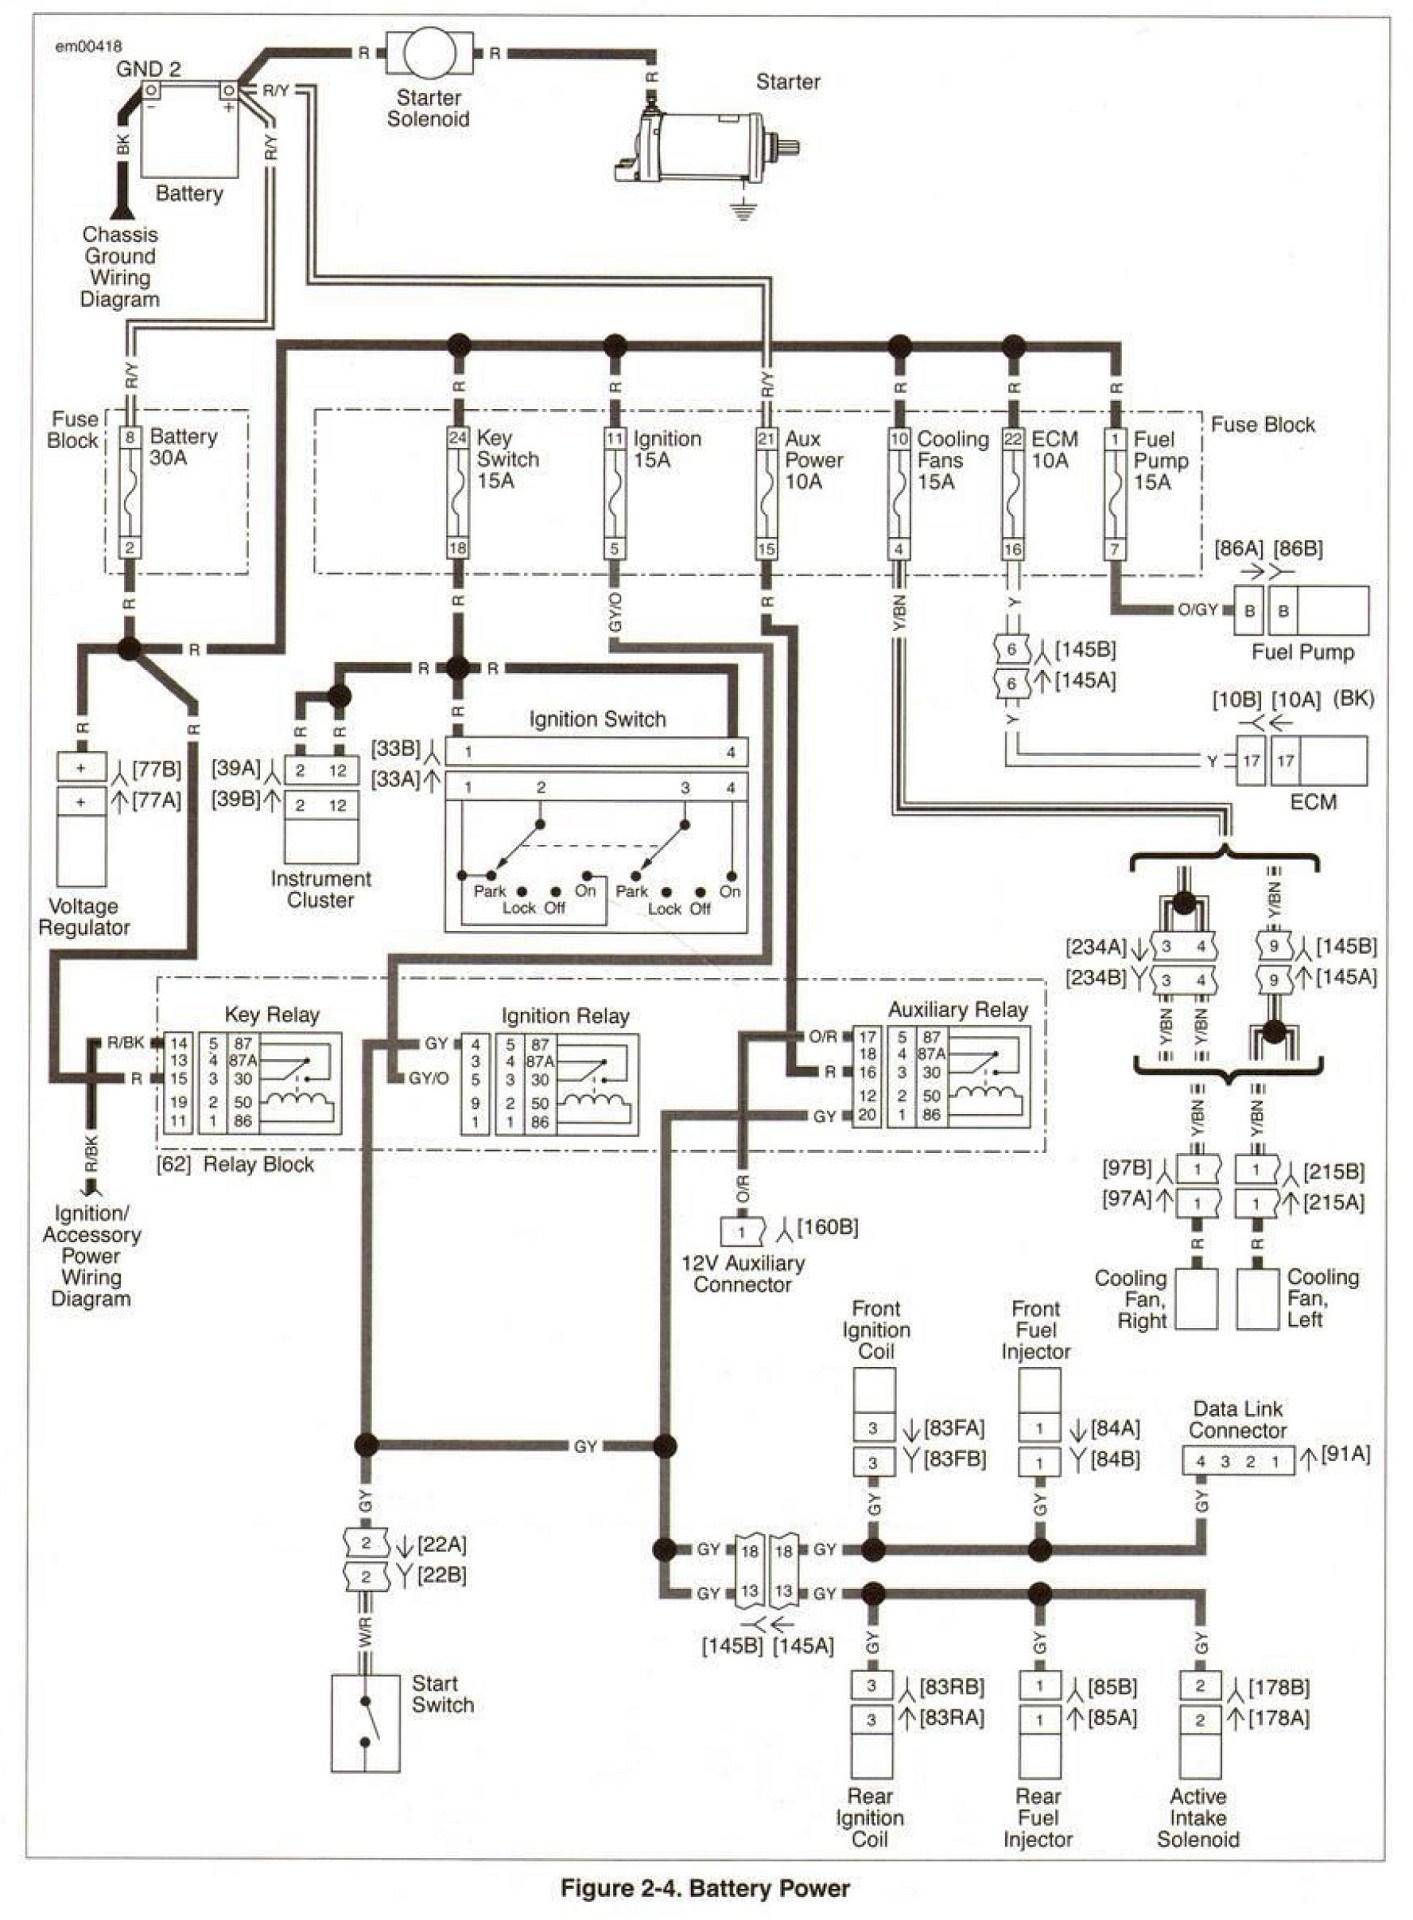 AH_2563] Buell Ignition Wiring Diagram Wiring Diagram